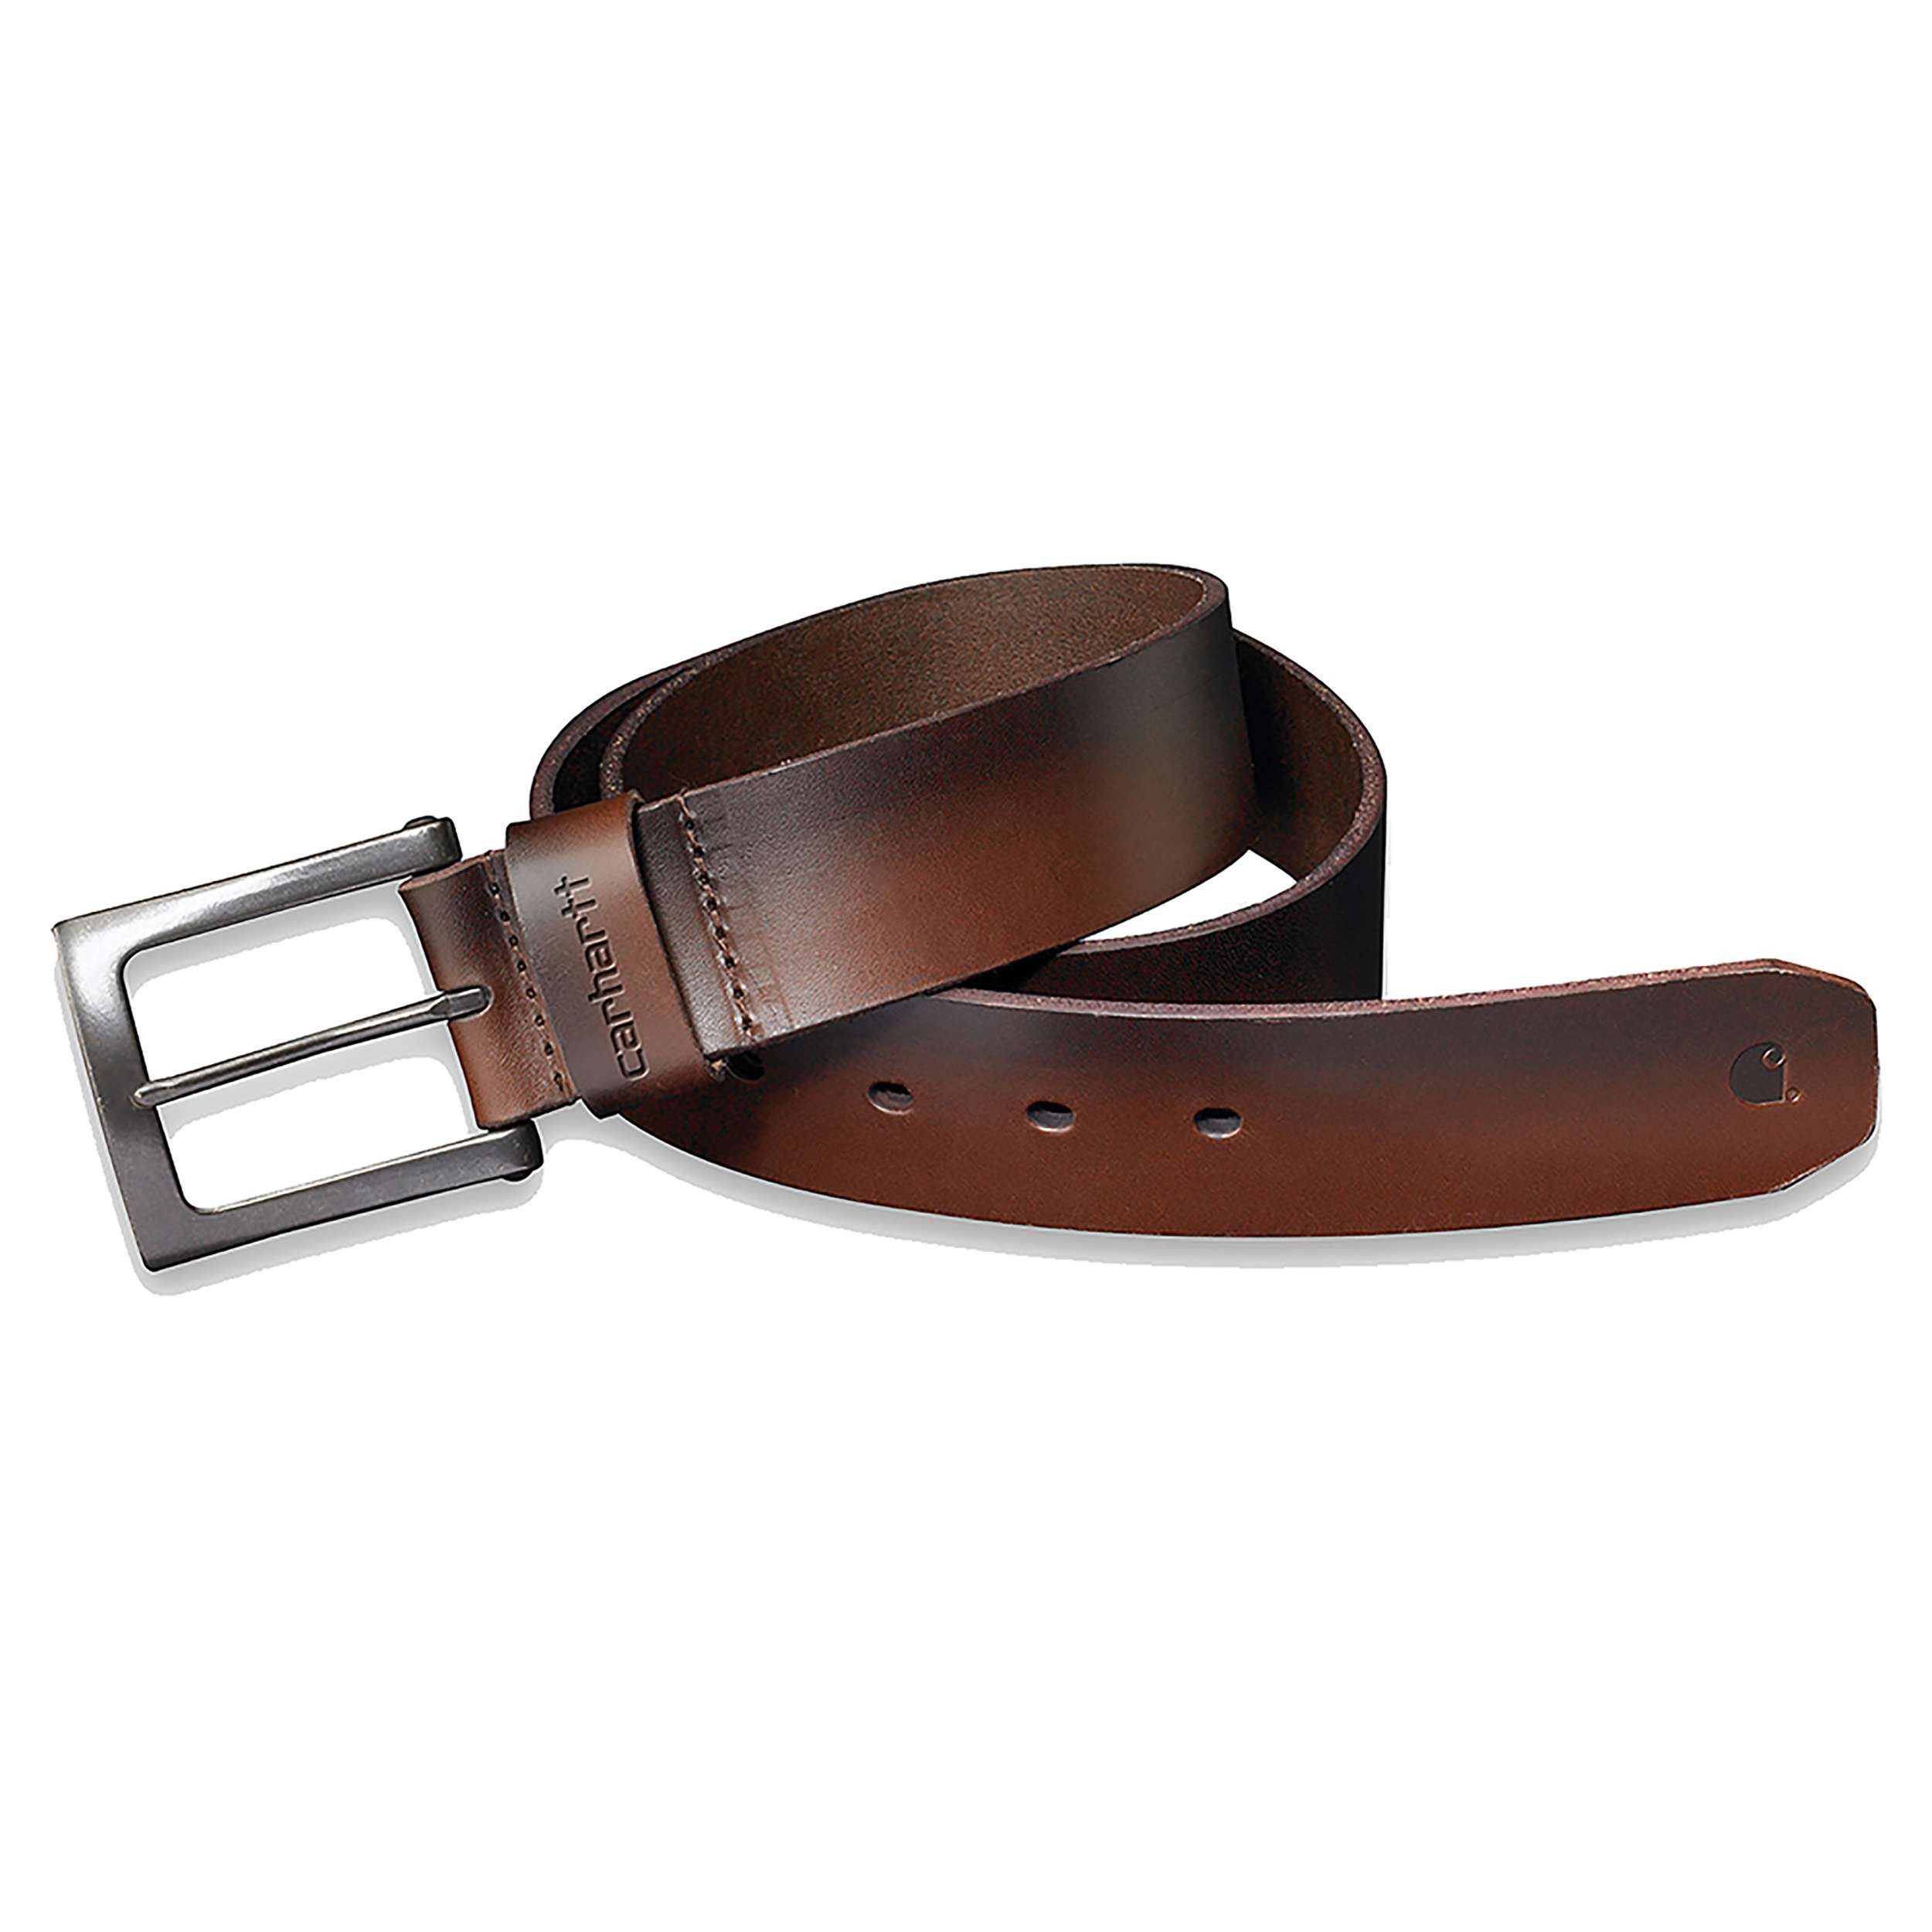 Ремень кожаный Carhartt Anvil Belt - 2203 (Carhartt Brown, W36)